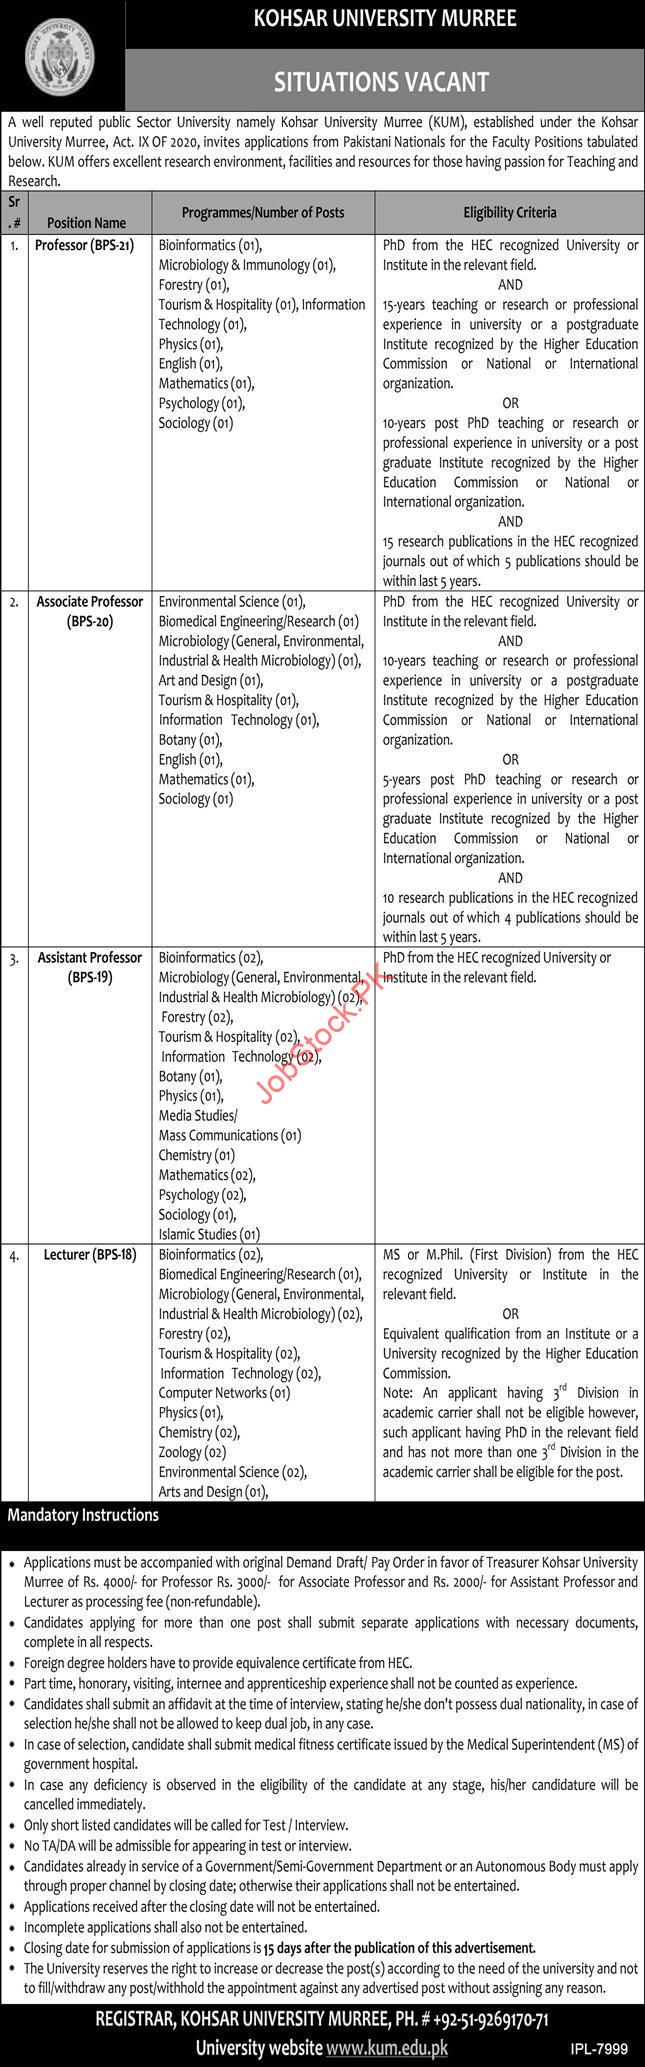 Kohsar University Murree Jobs